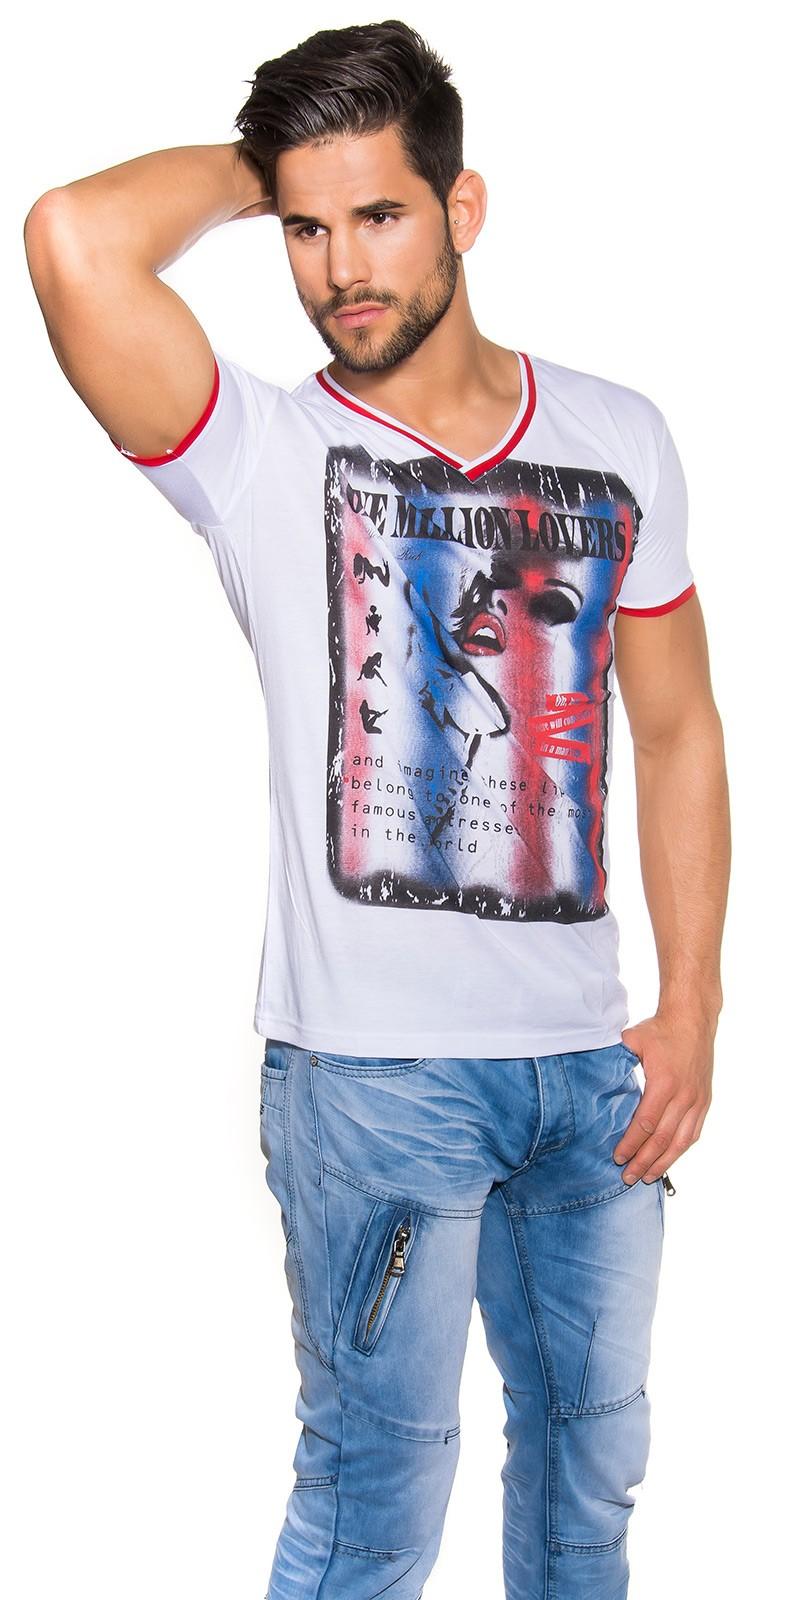 la moda cu decolteu in v Shirt One Million Lovers